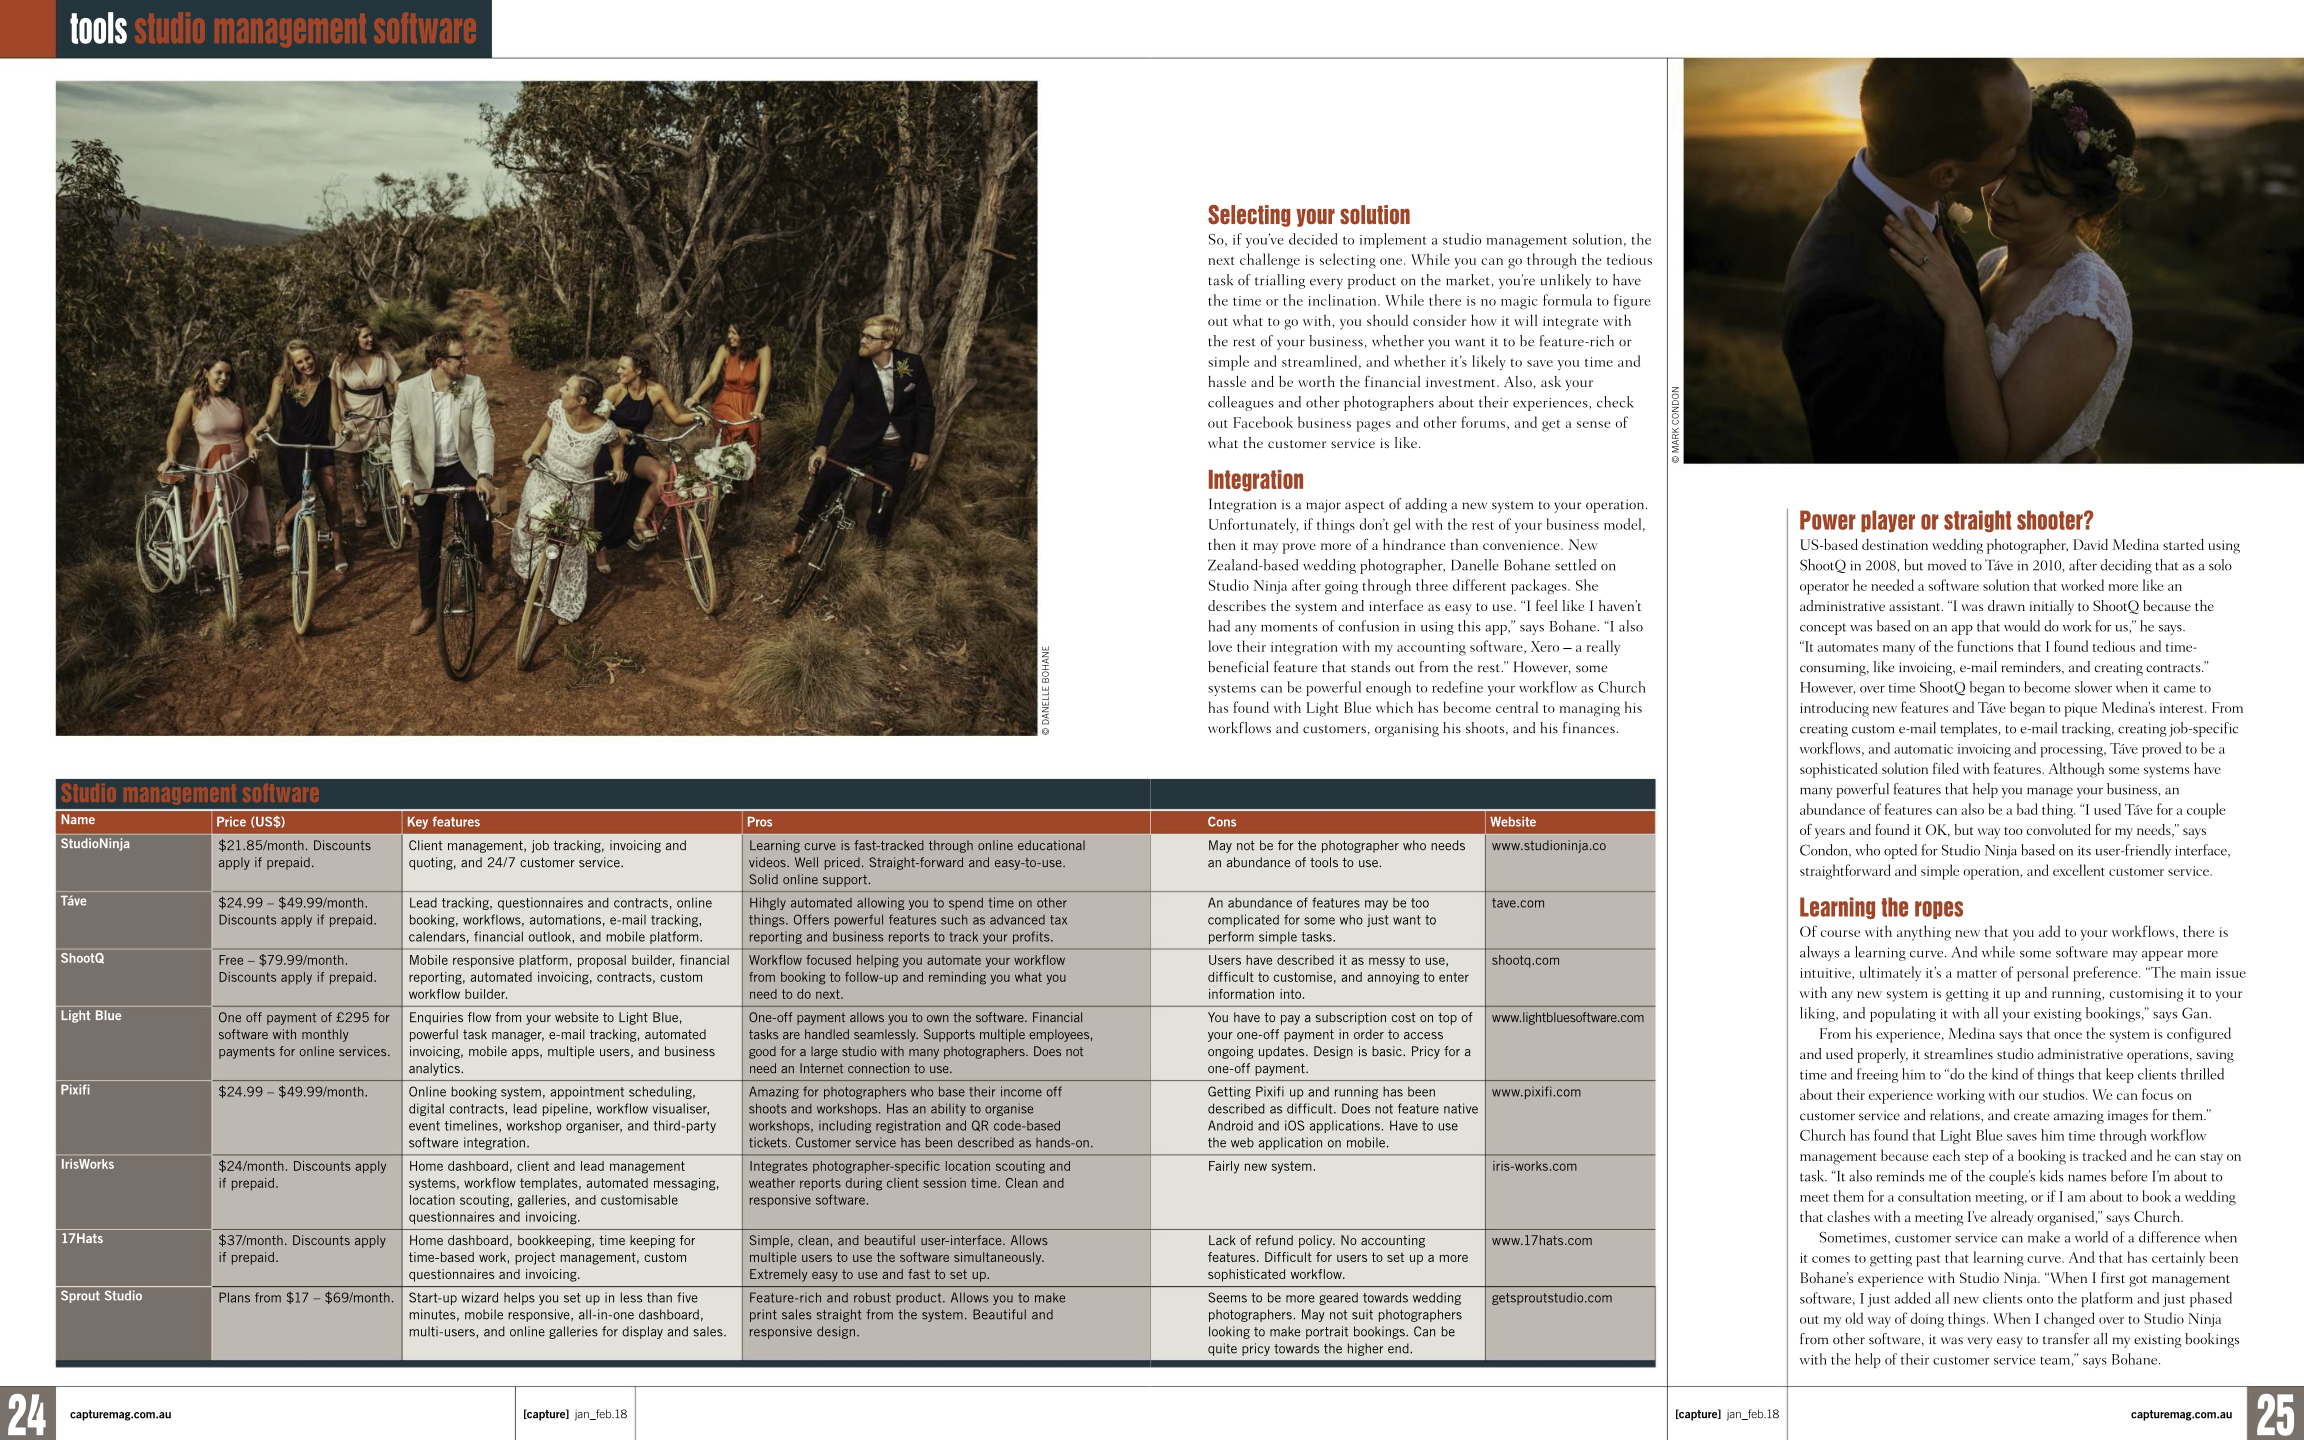 capture-magazine-nick-church-studiomanagement-page-2.png